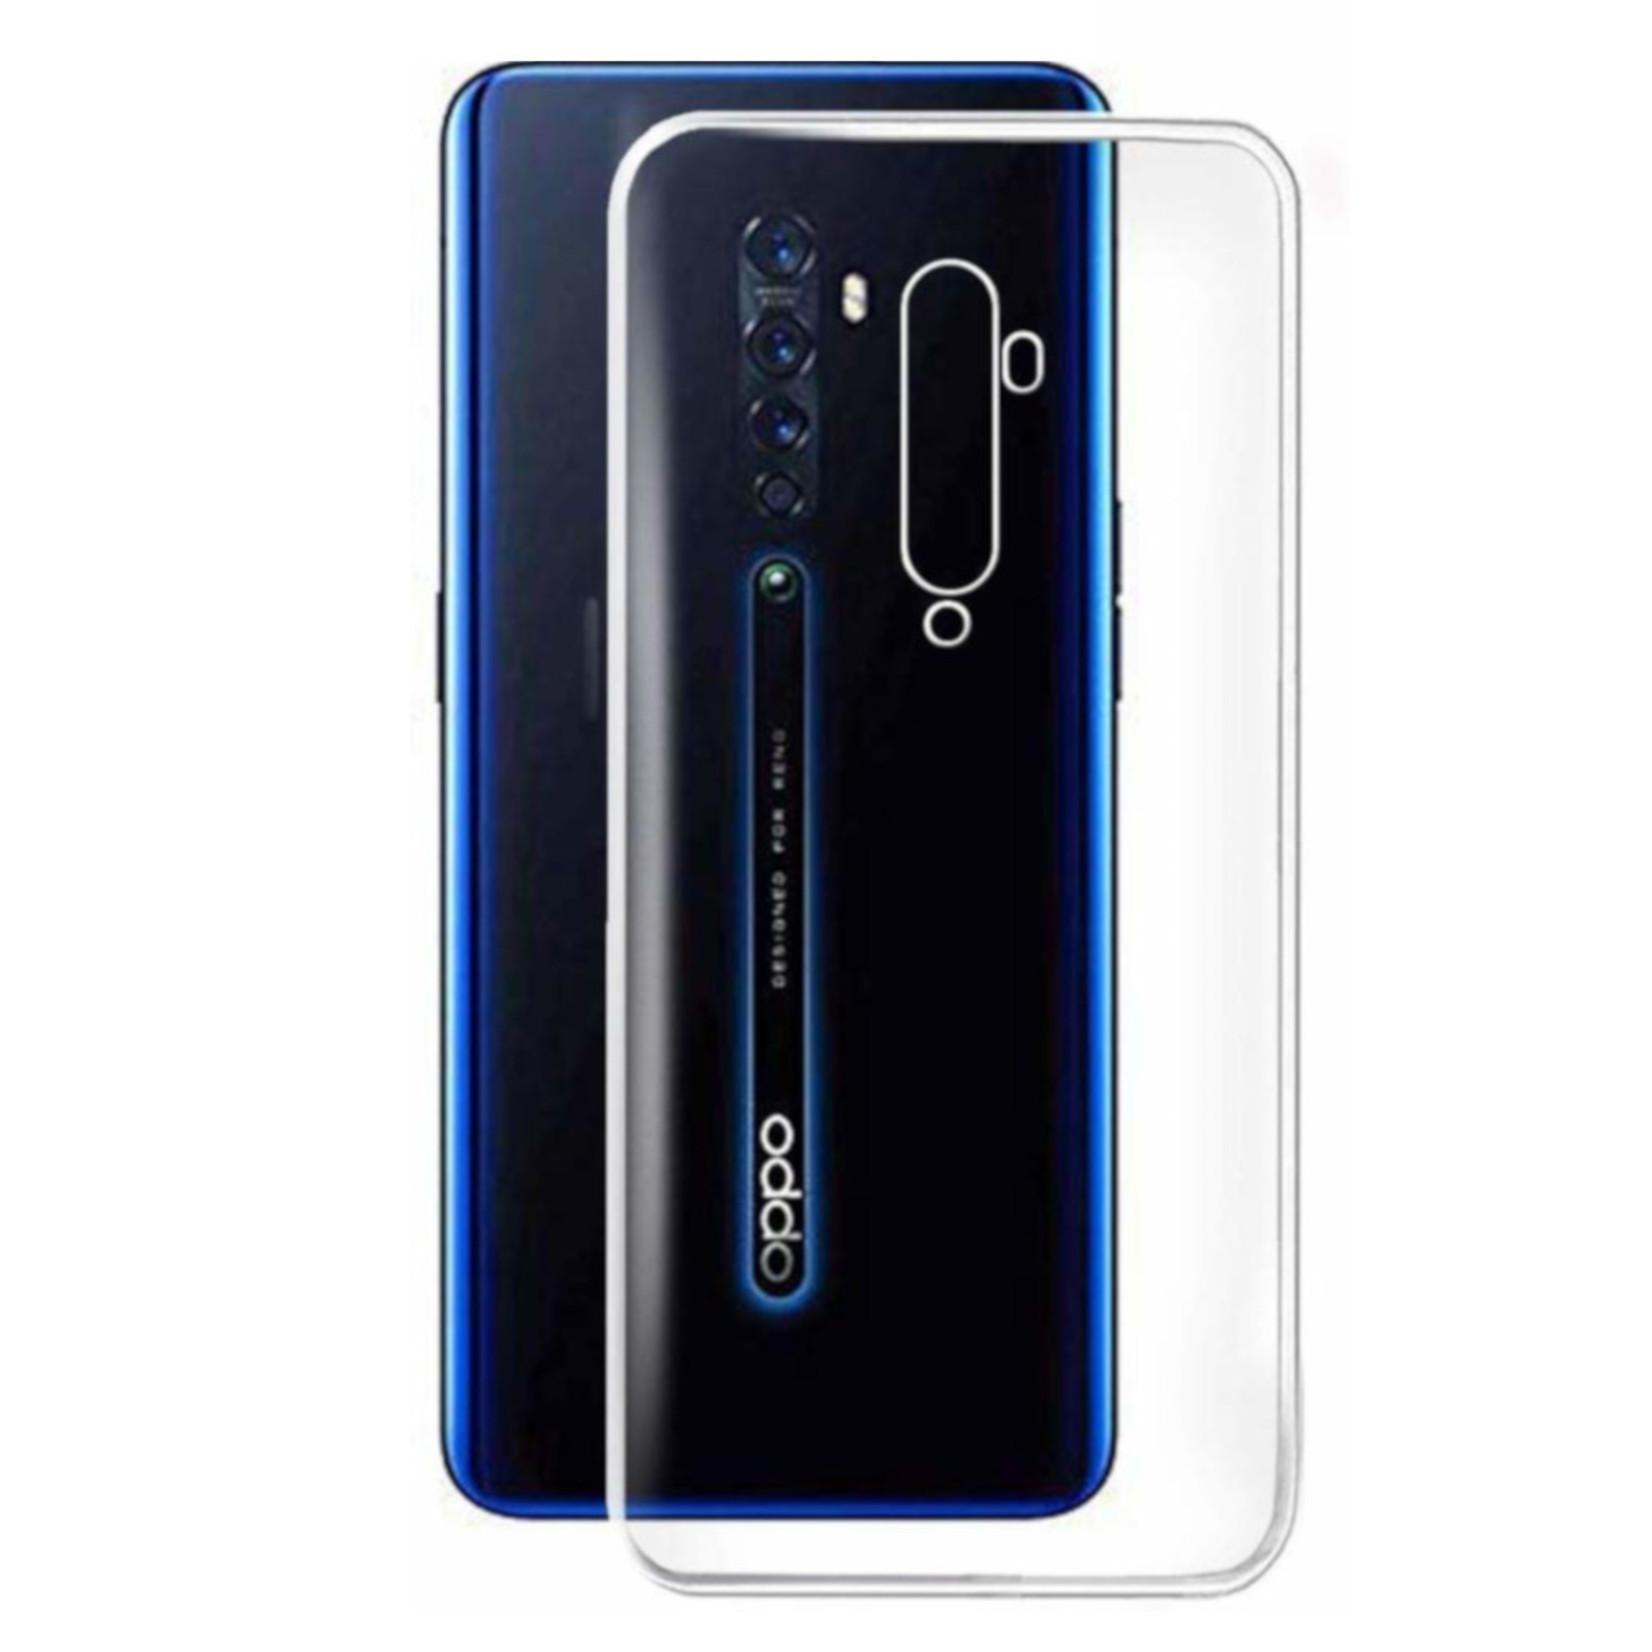 Colorfone Hoesje CoolSkin3T voor Oppo Reno 2 Tr. Wit